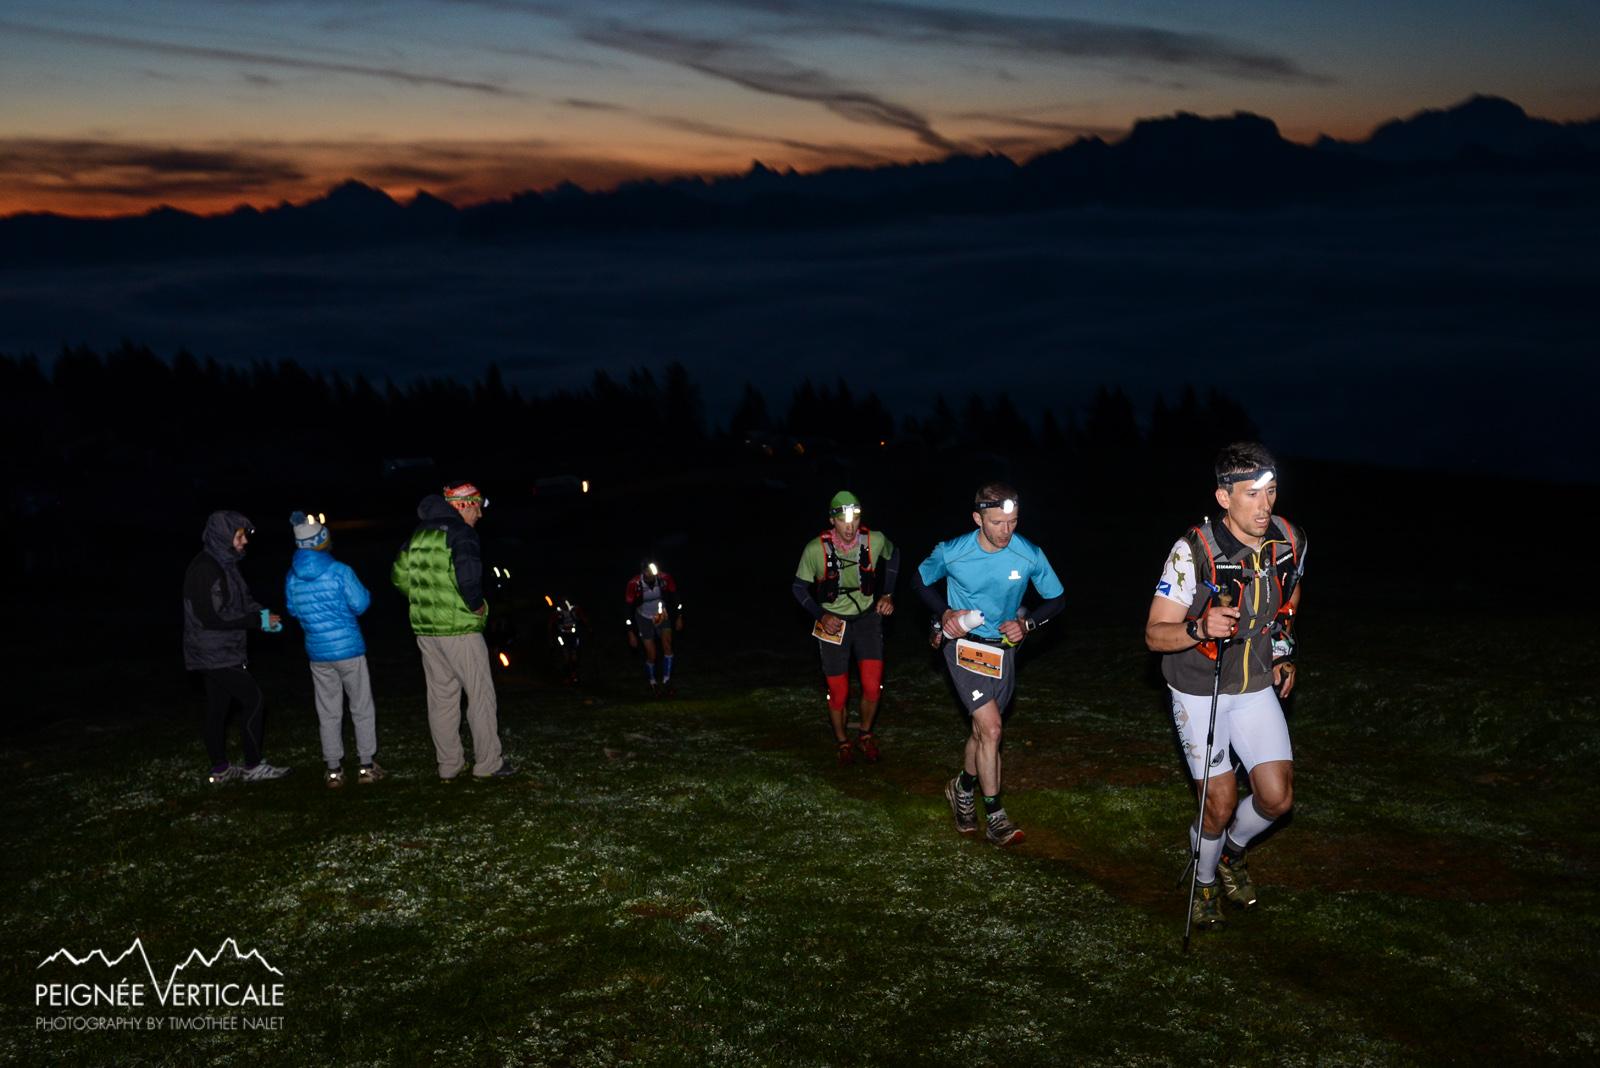 MaxiRace-Annecy-2014-Team-Hoka-Timothee-Nalet-0722.jpg